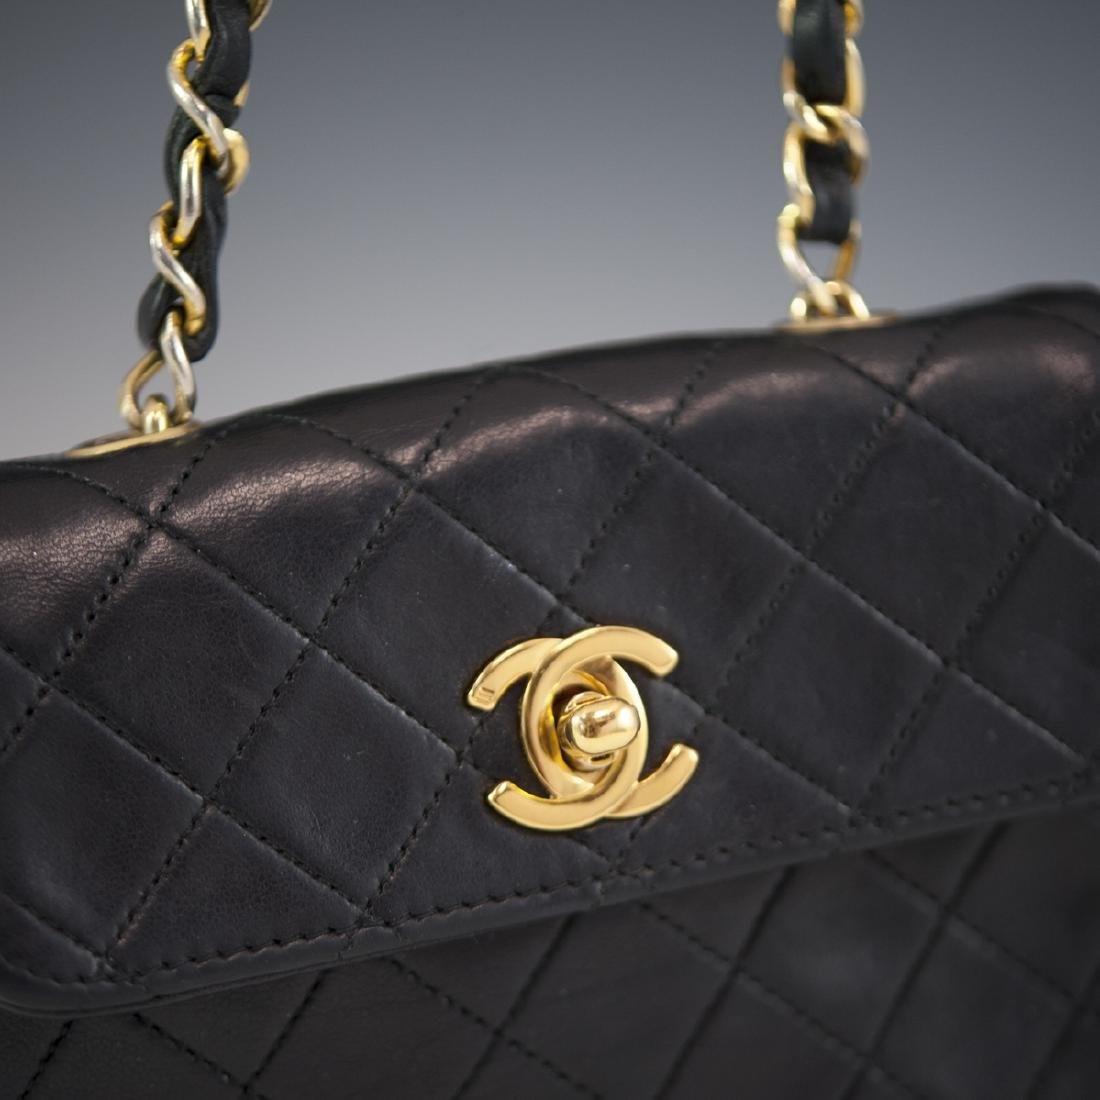 Chanel Mini Black Leather Flap Bag - 4